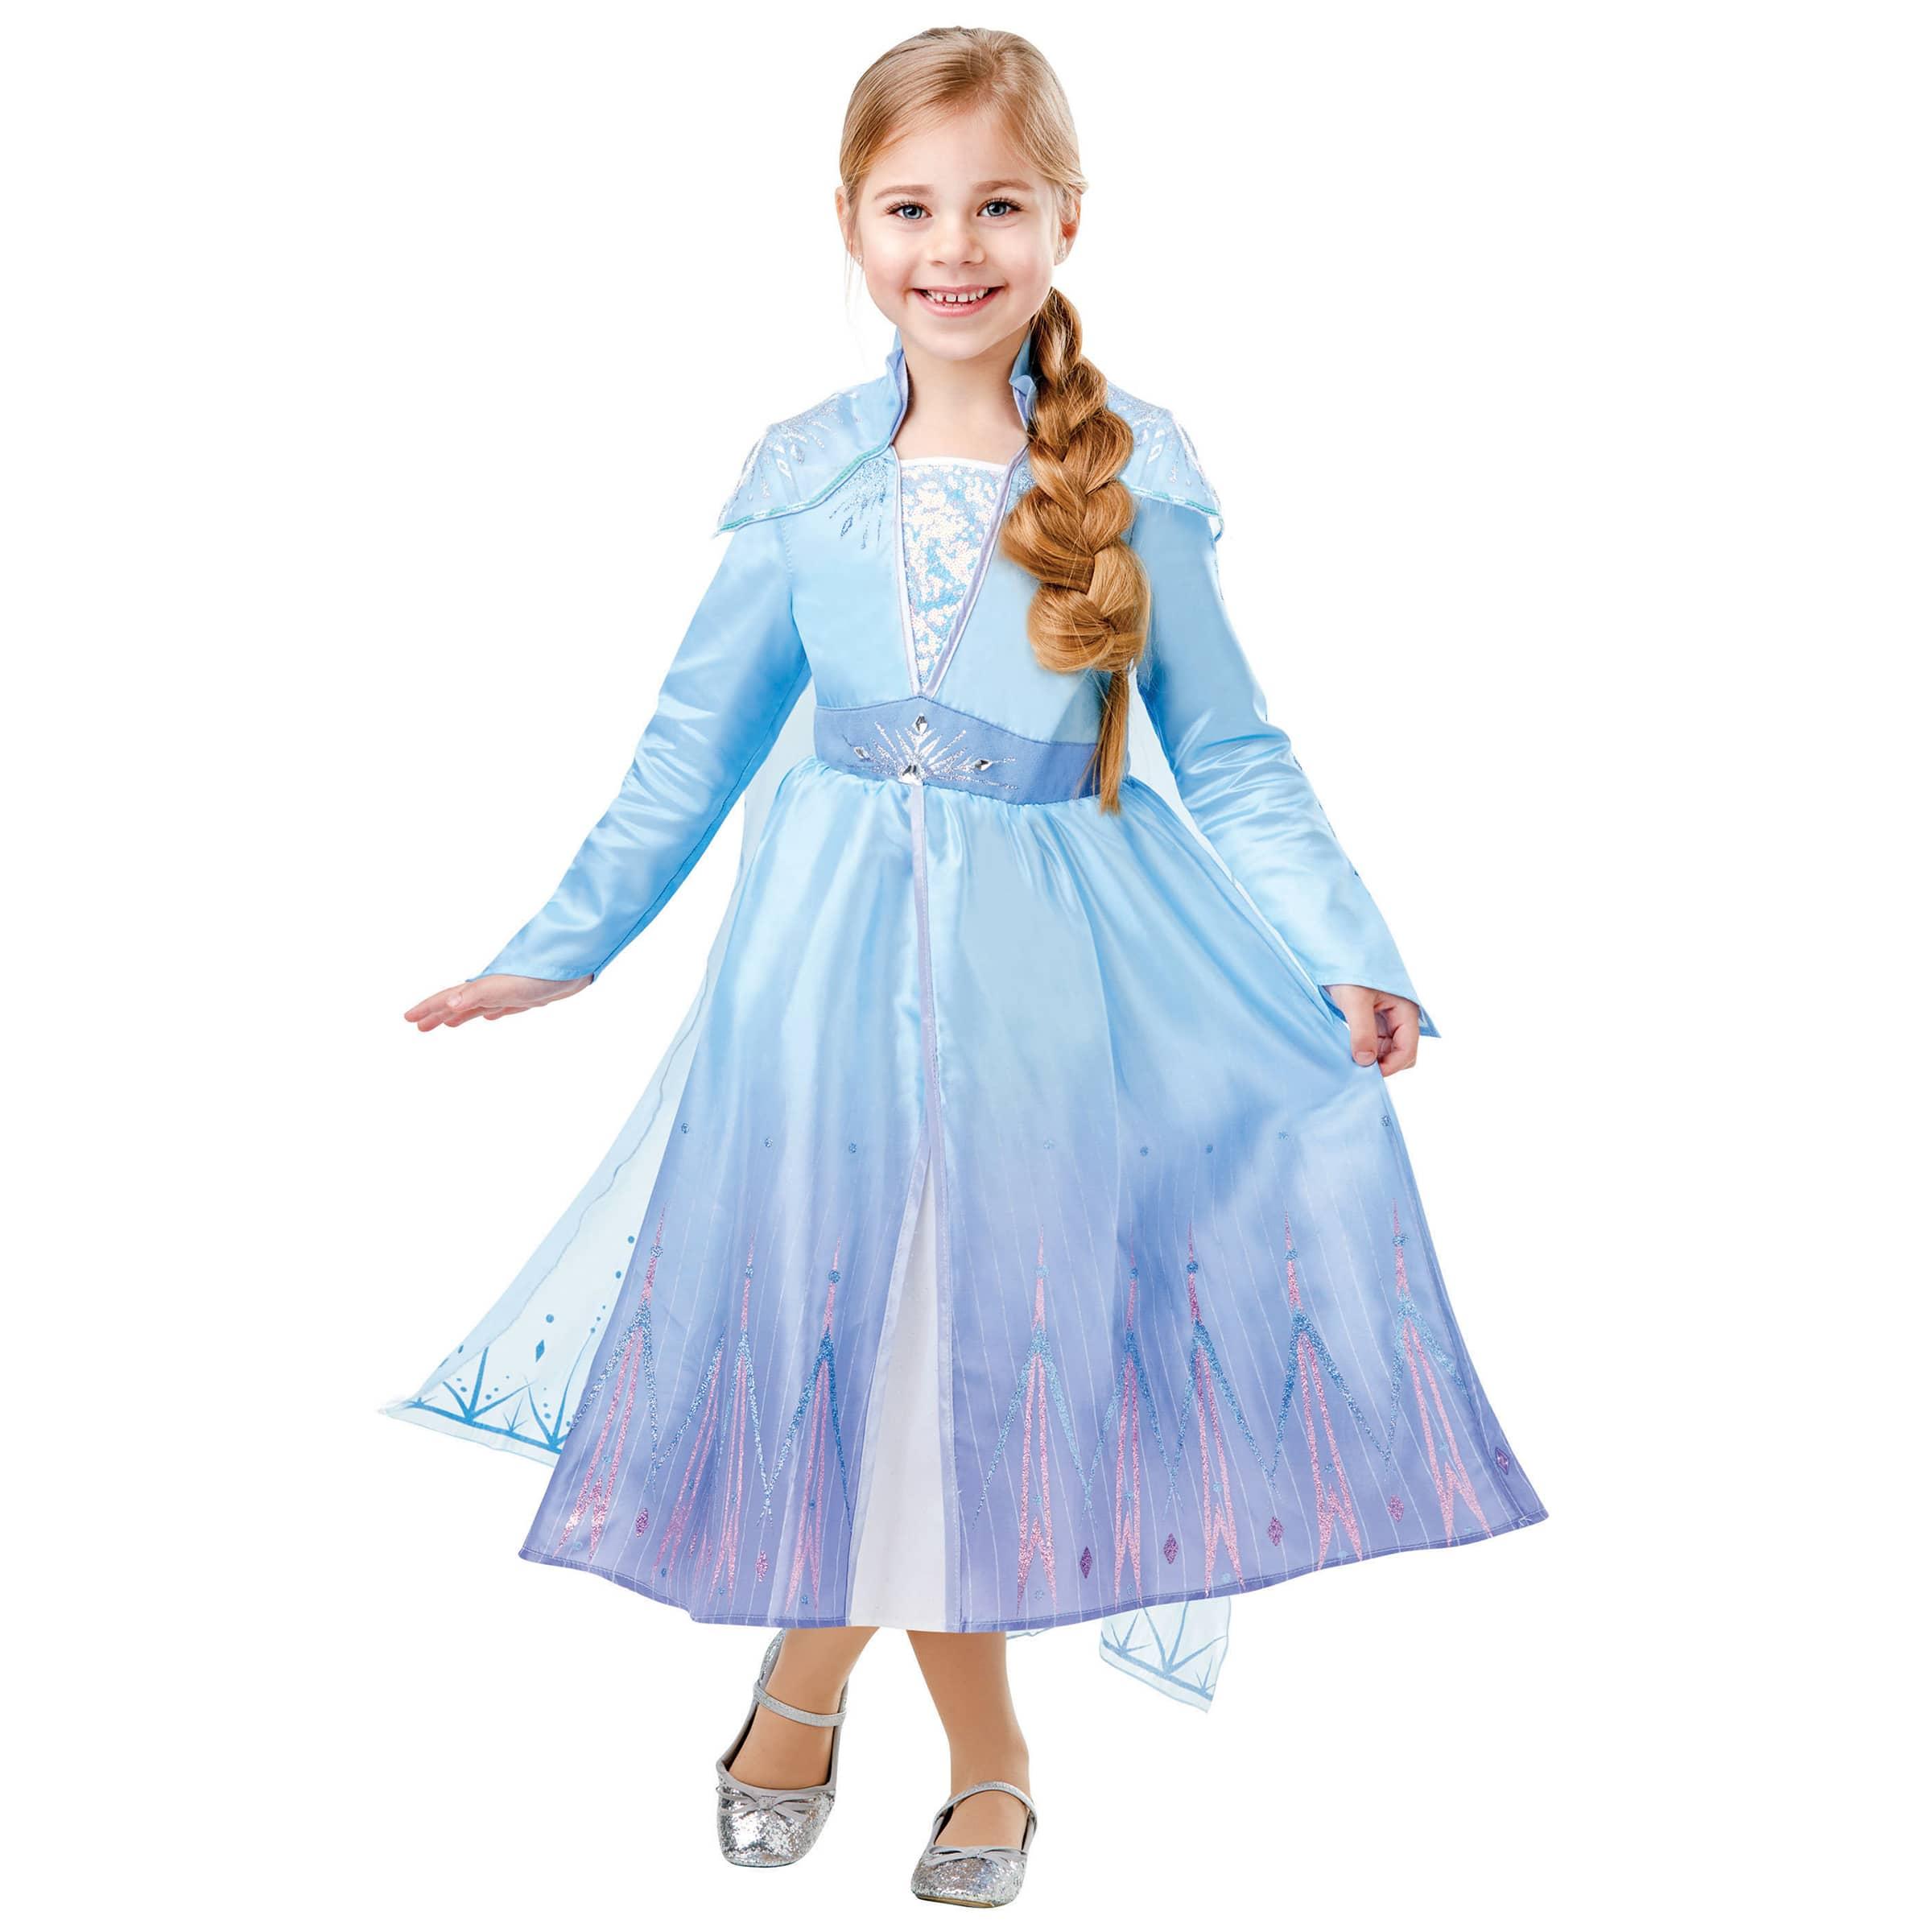 ©Disney Frozen 2 Musical Adventure Elsa Singing Doll